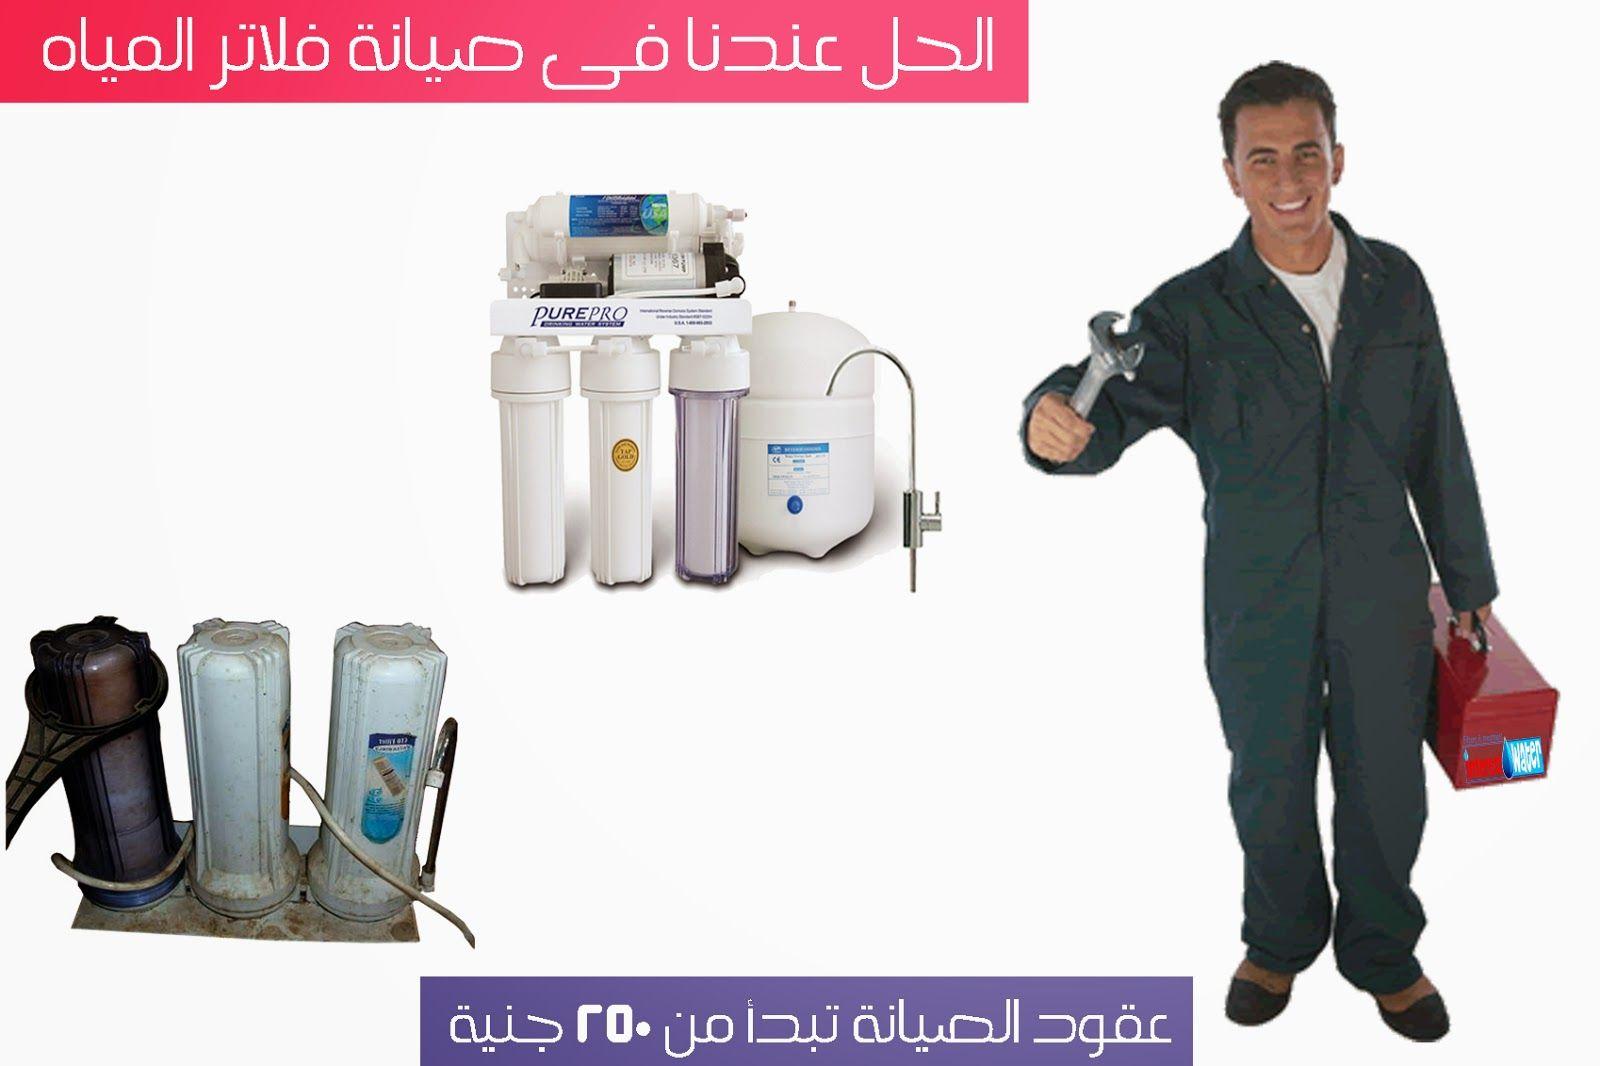 افضل فلتر مياه فى مصر اسعار فلاتر المياه صيانة فلتر المياه فلاتر المياه Water Filter Vacuum Home Appliances